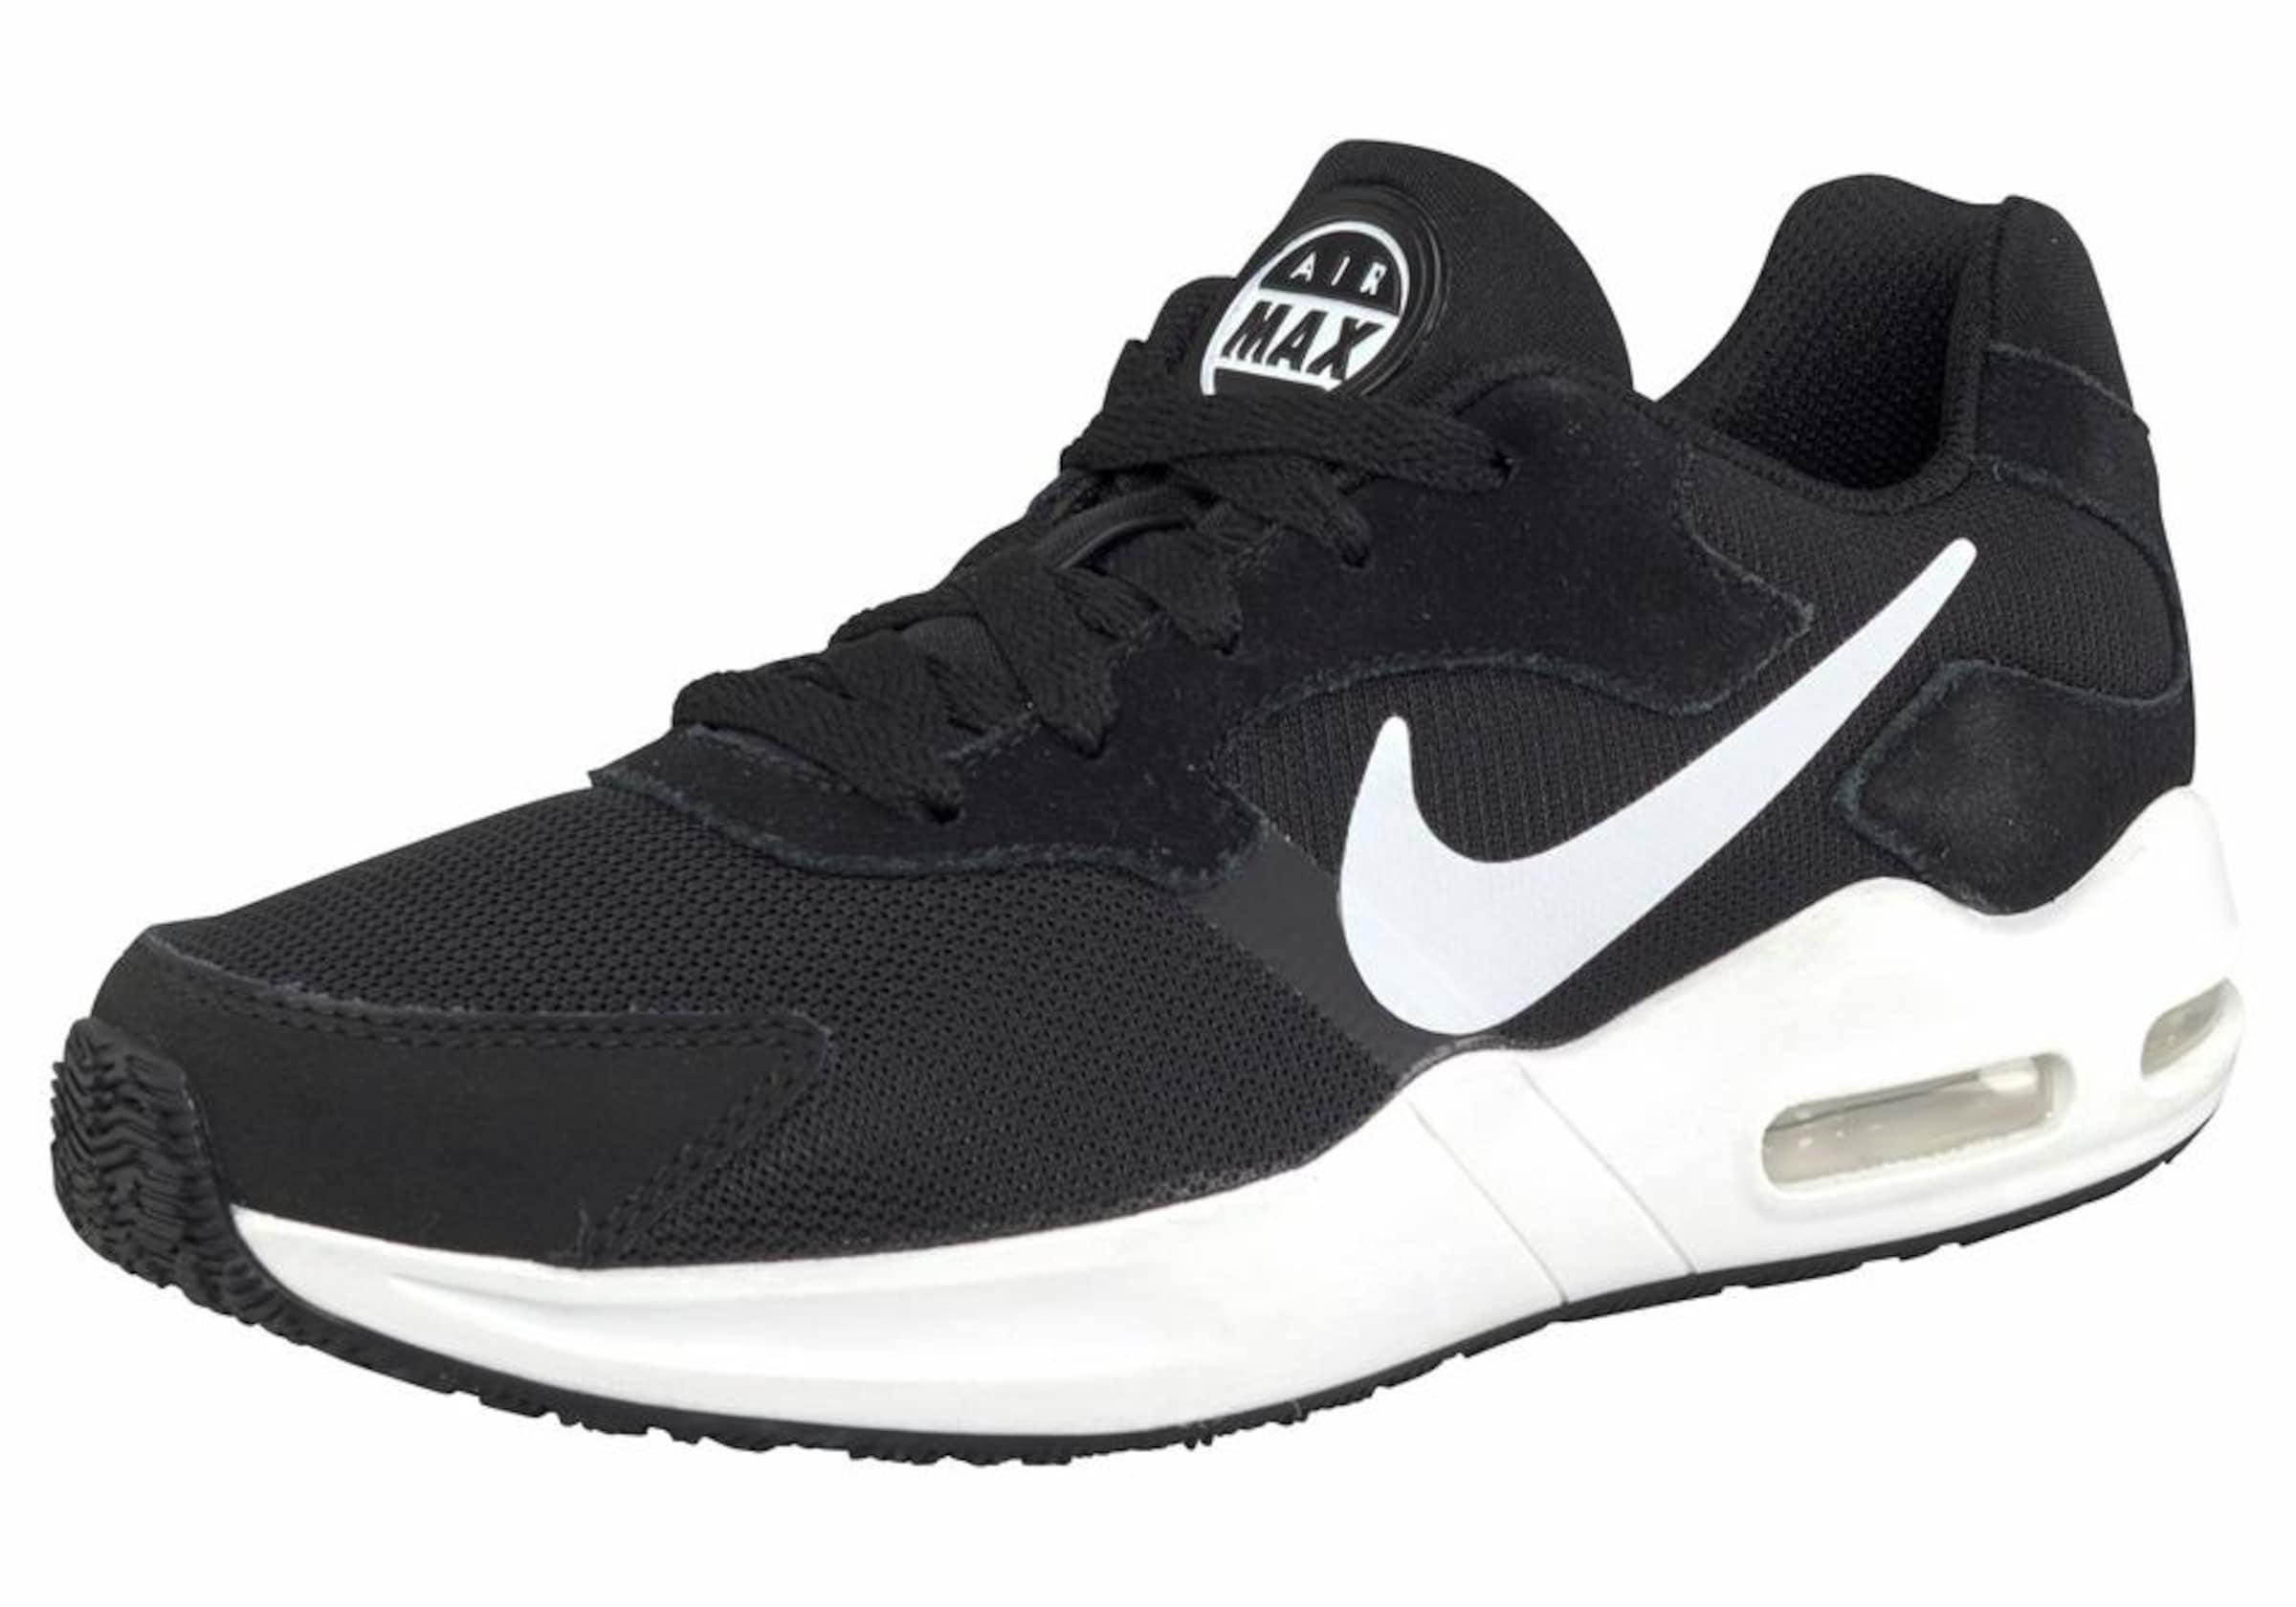 Kaufen Günstigen Preis Nike Sportswear Sneaker 'WMNS AIR MAX GUILE' Neueste Preiswerte Online kGgGoS